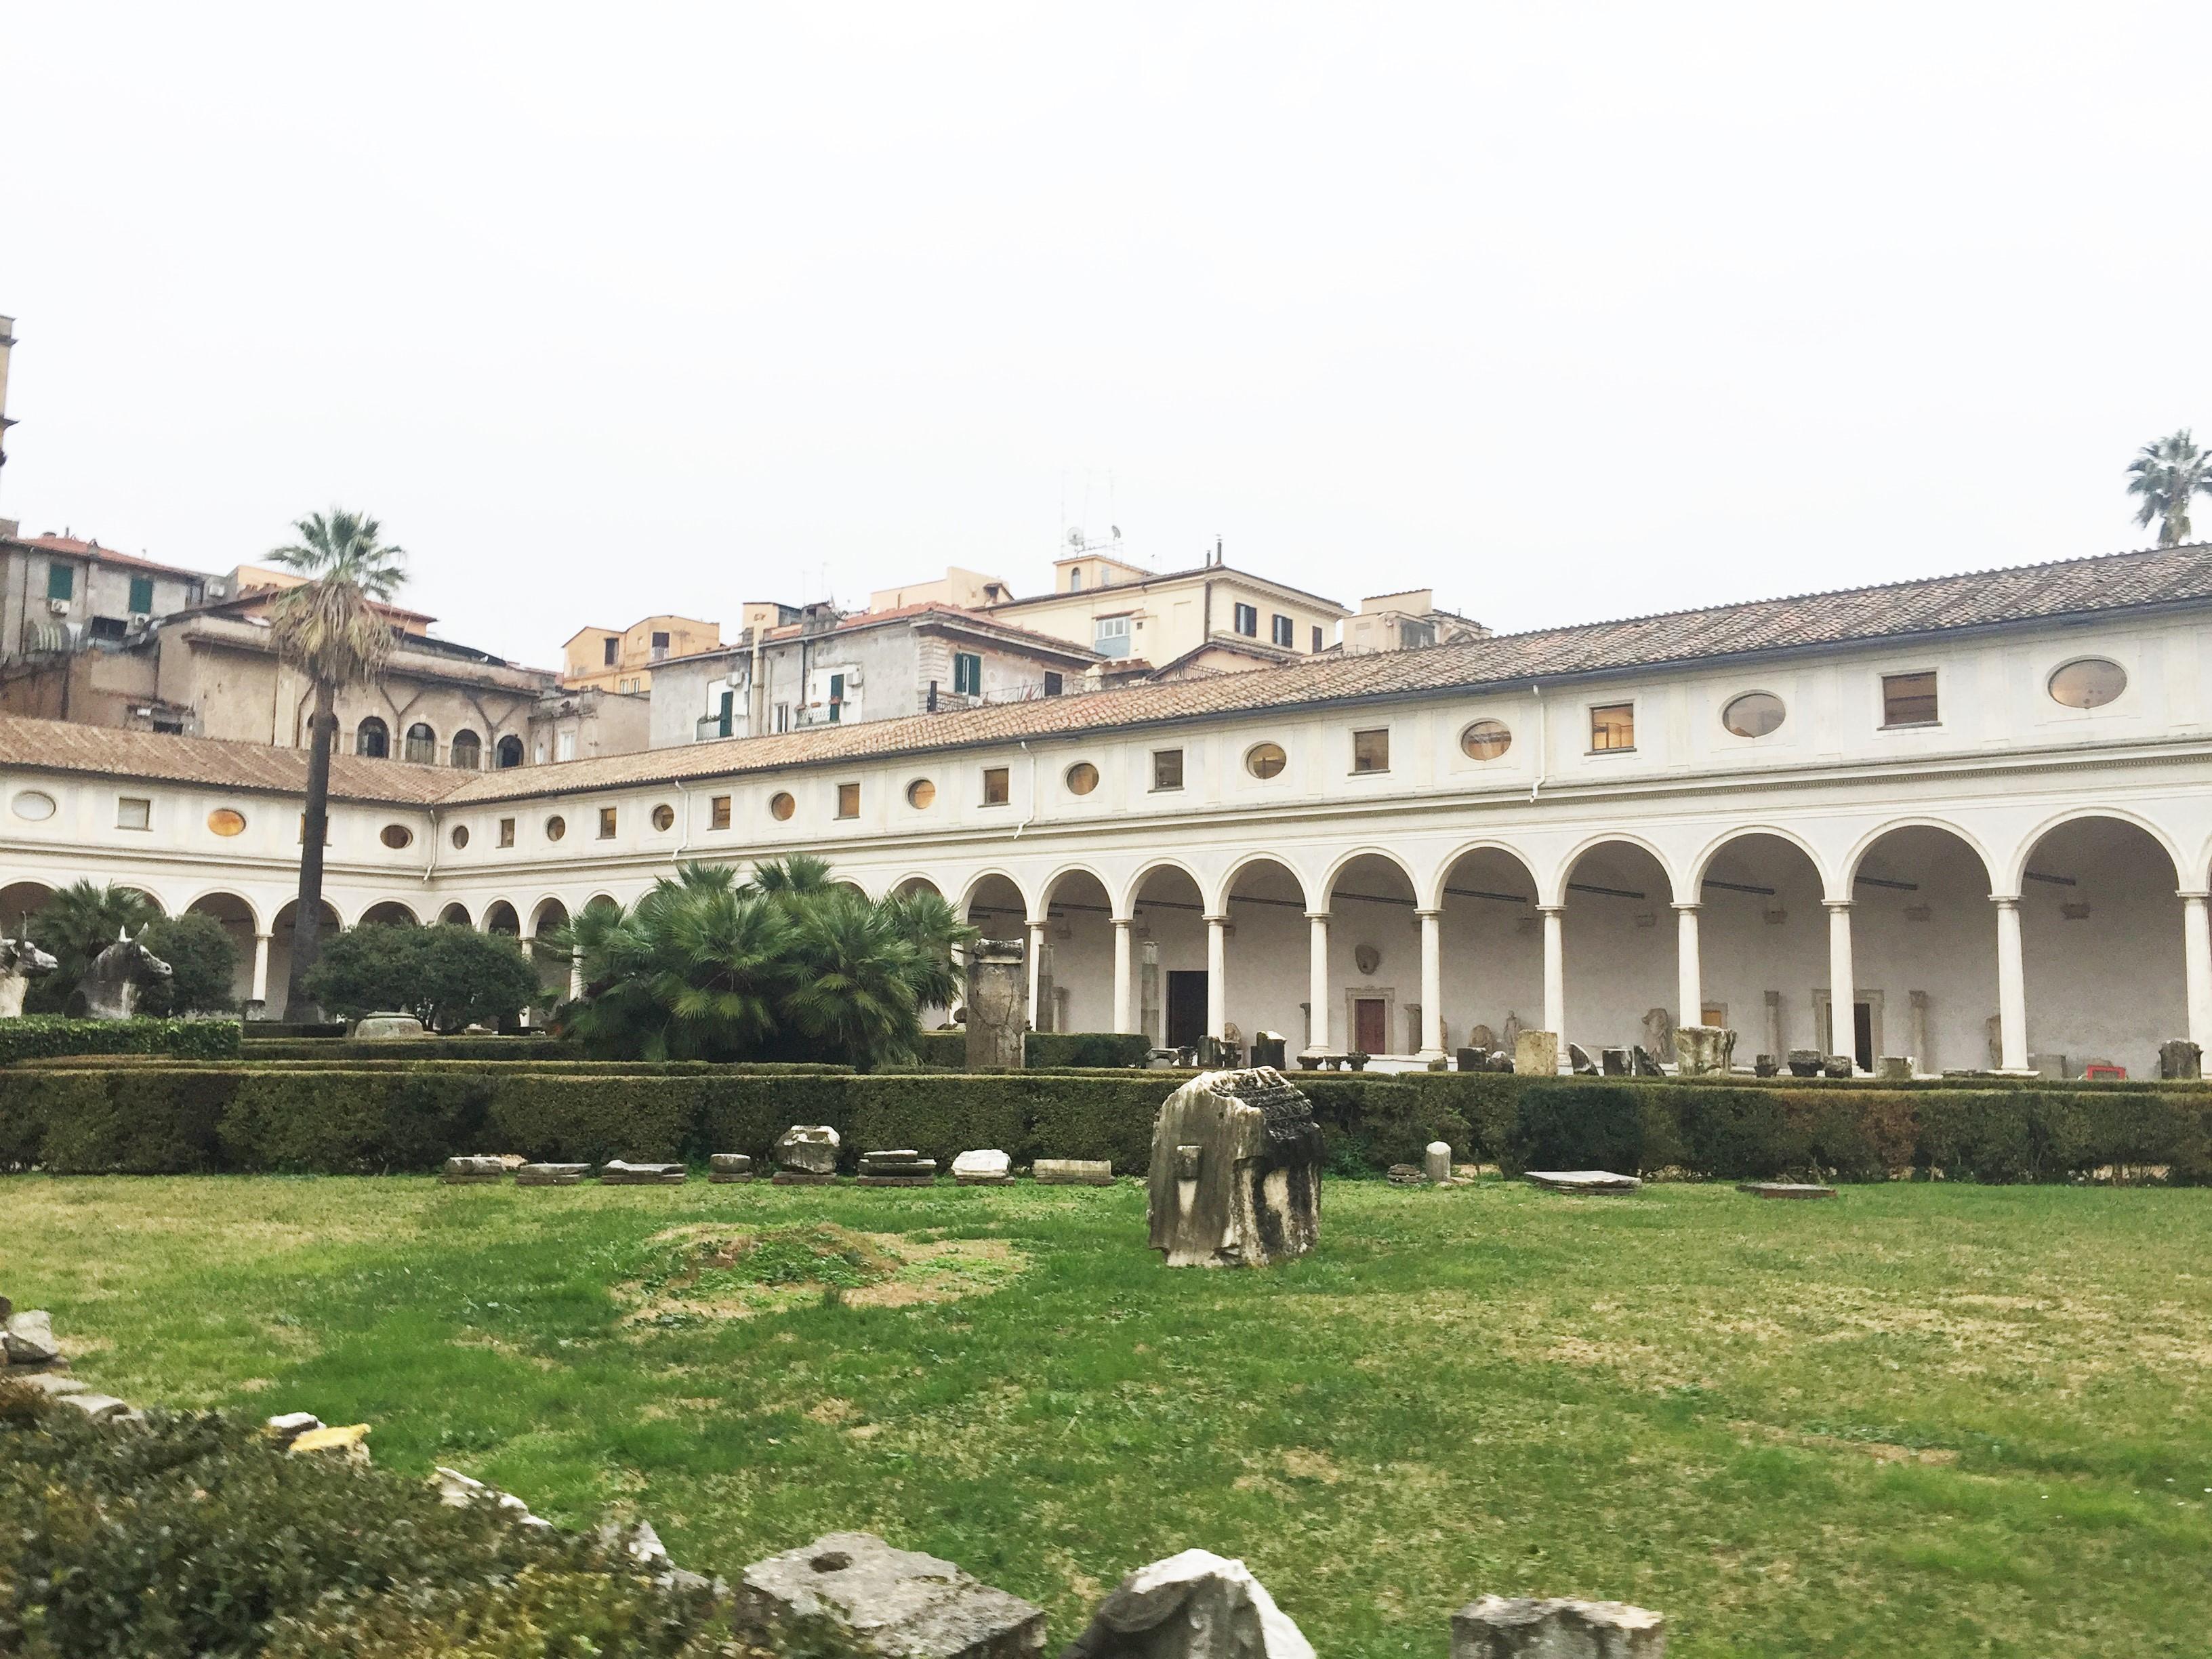 Claustro das Termas de Diocleziano